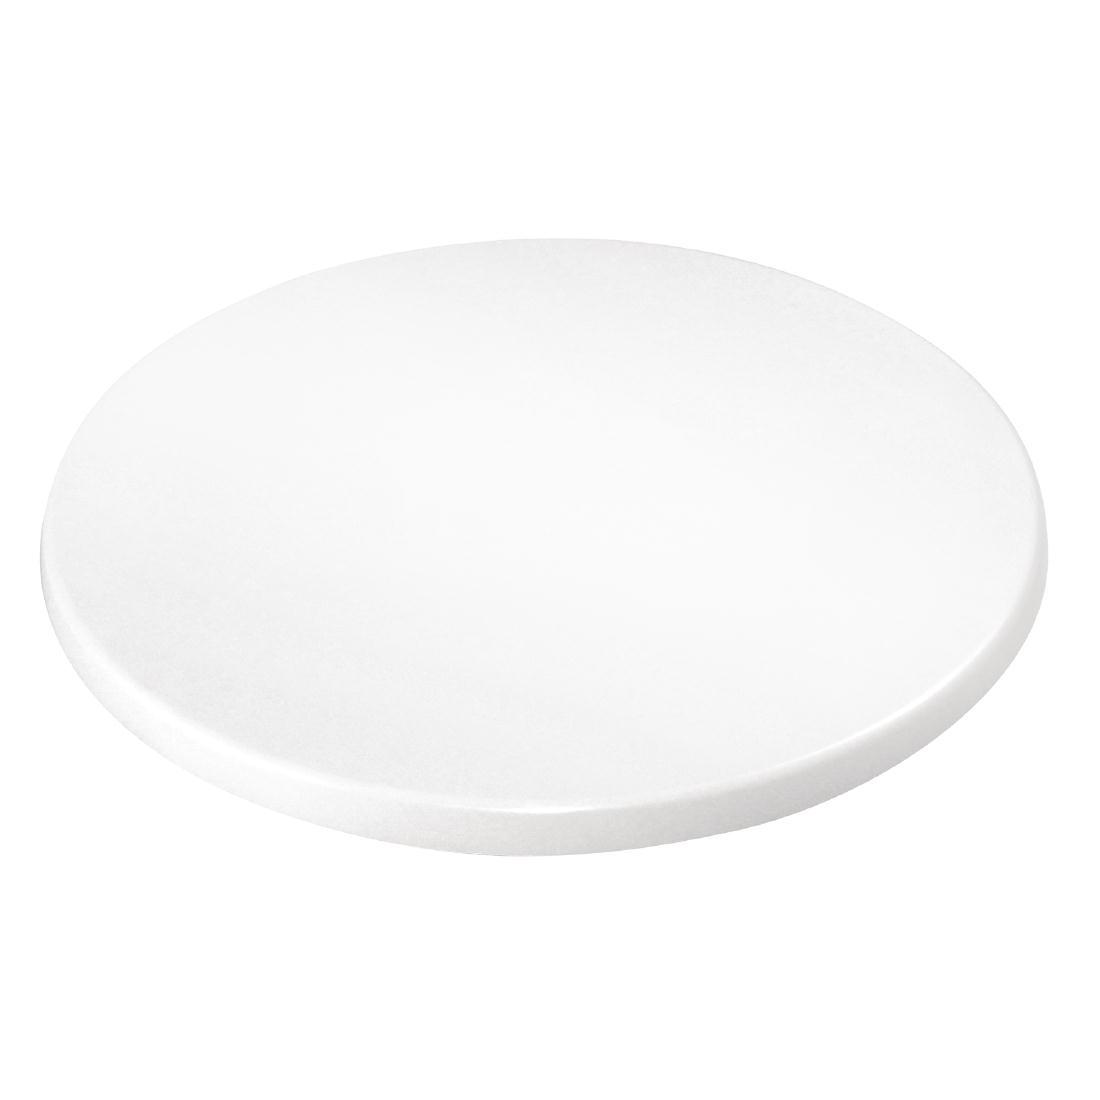 Plateau de table rond Bolero blanc 800mm